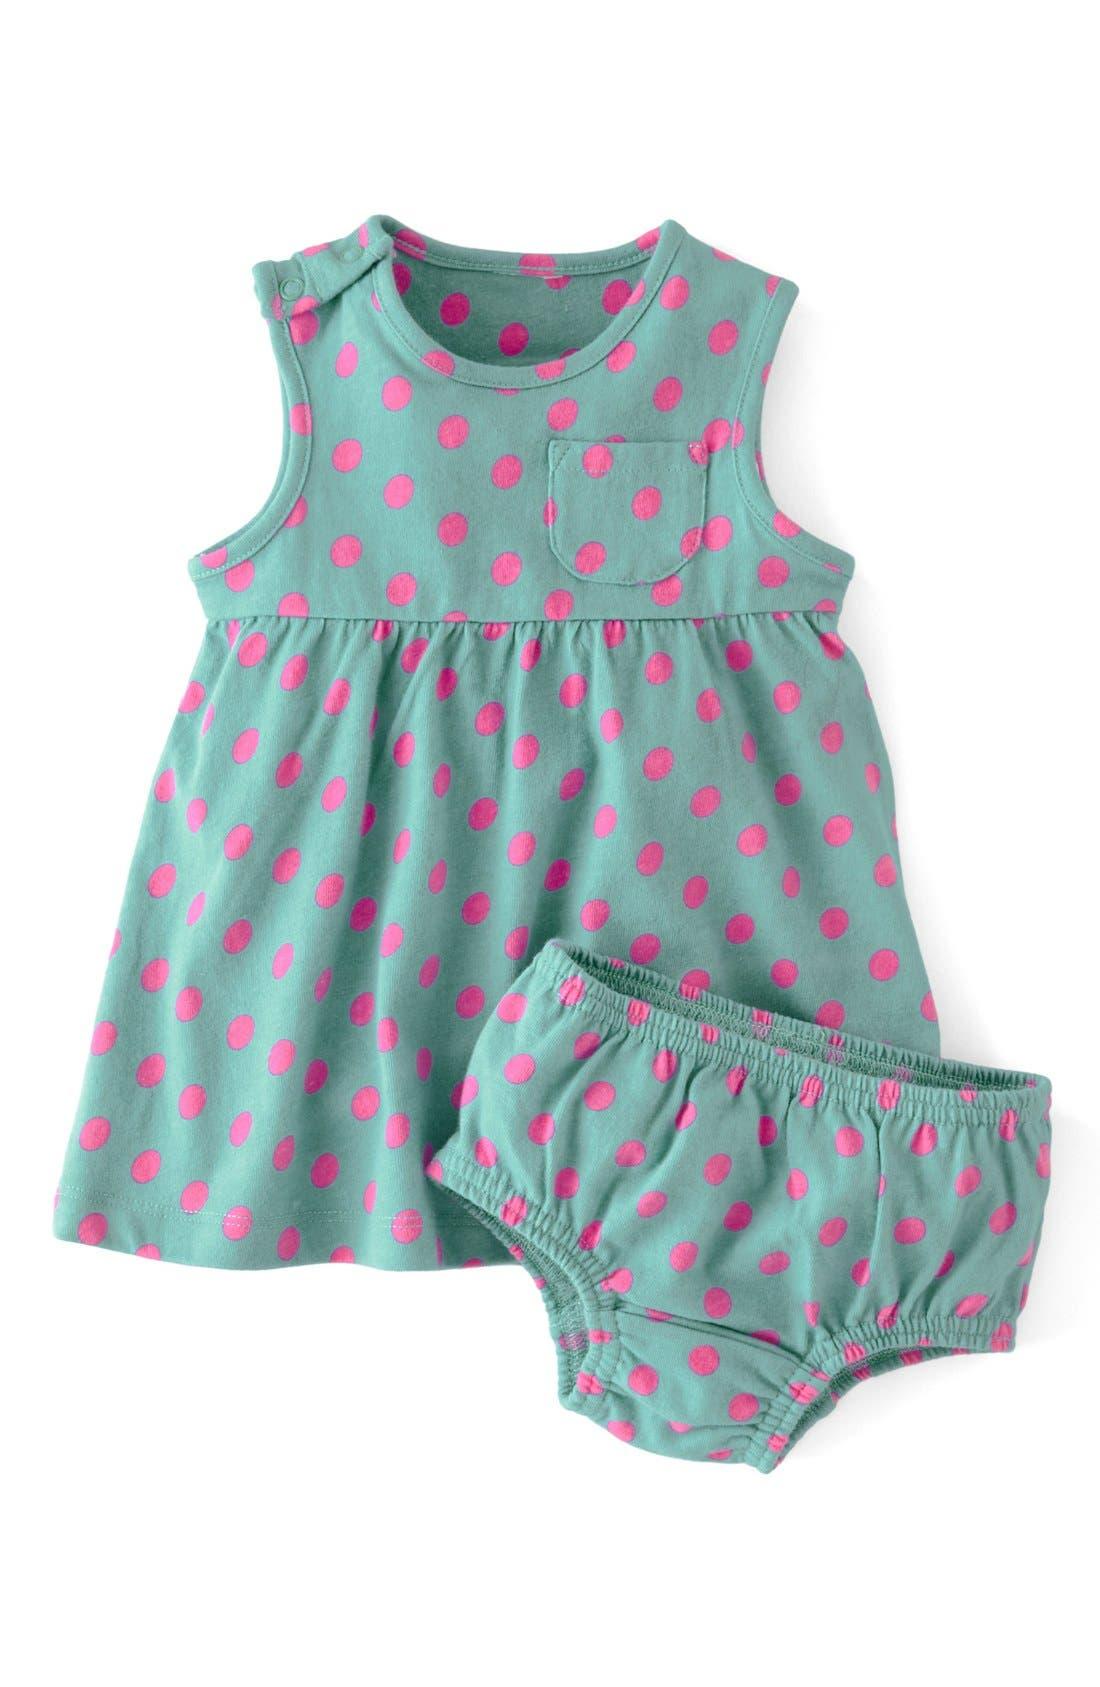 Main Image - Mini Boden Essential Spotty Jersey Dress (Baby Girls)